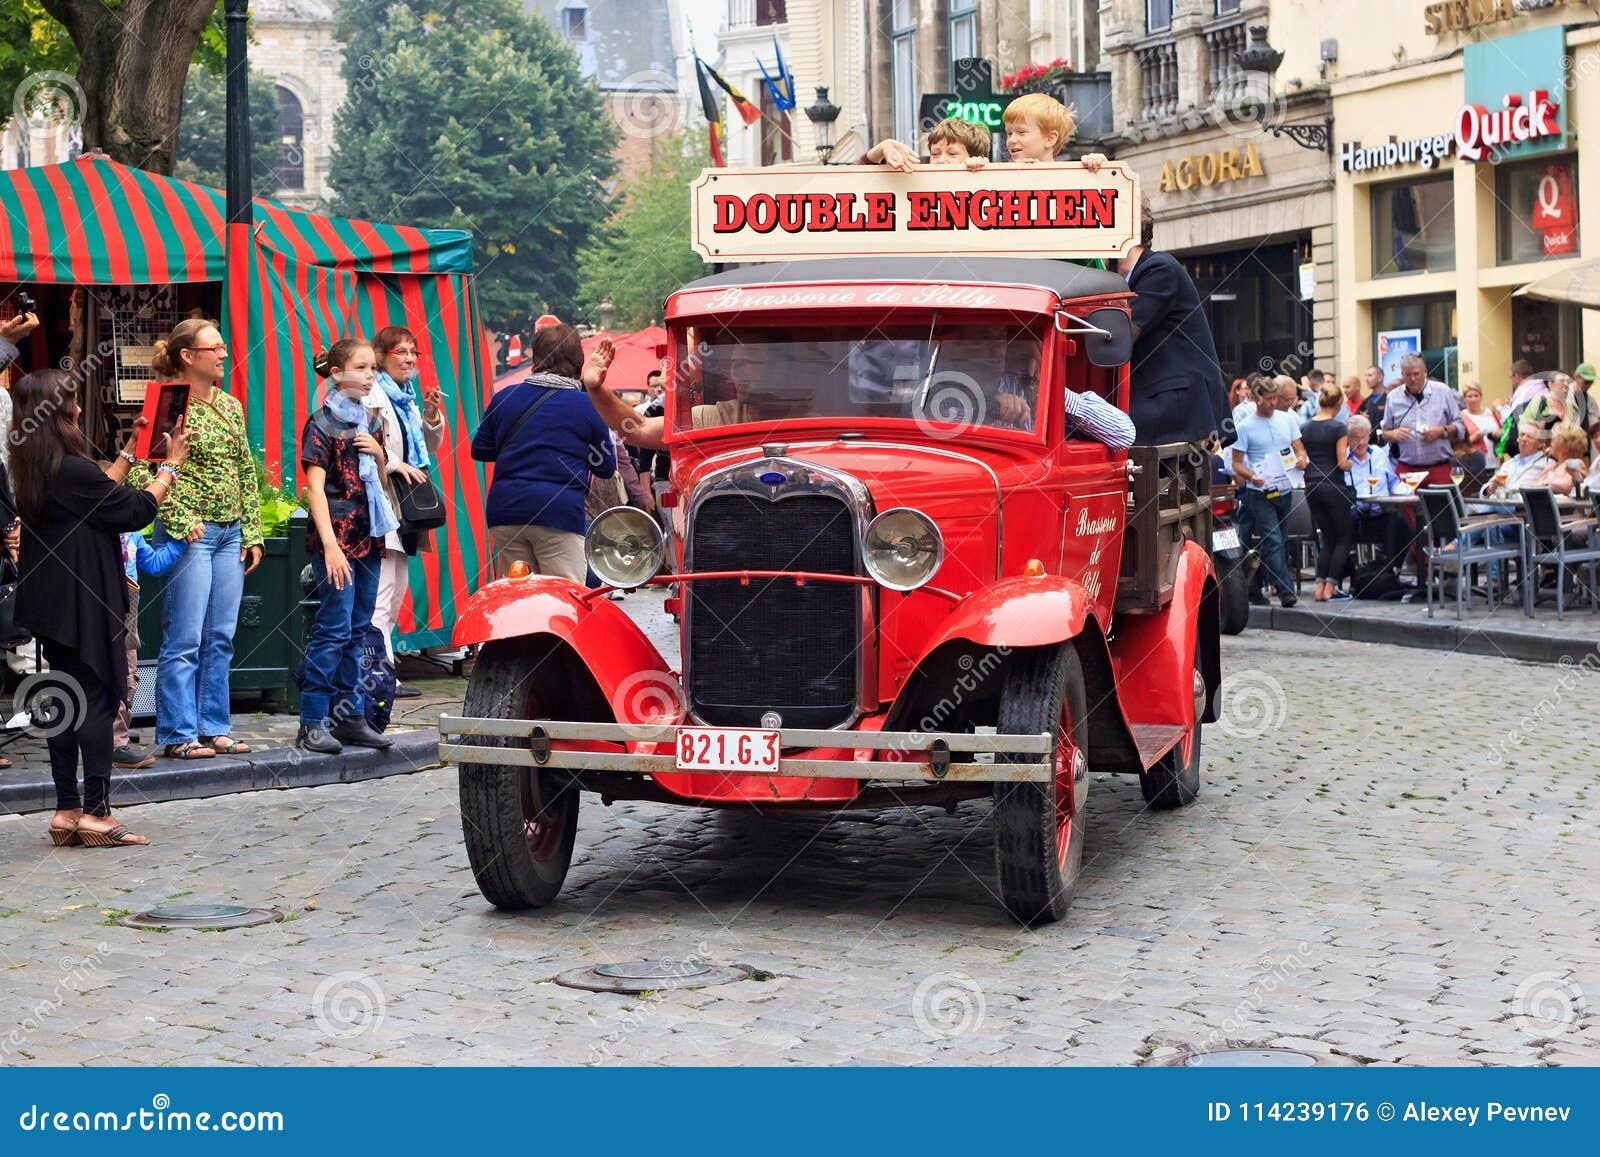 BRYSSEL BELGIEN - SEPTEMBER 06, 2014: Presentation av det dubbla Enghien bryggeriet med den retro Ford bilen